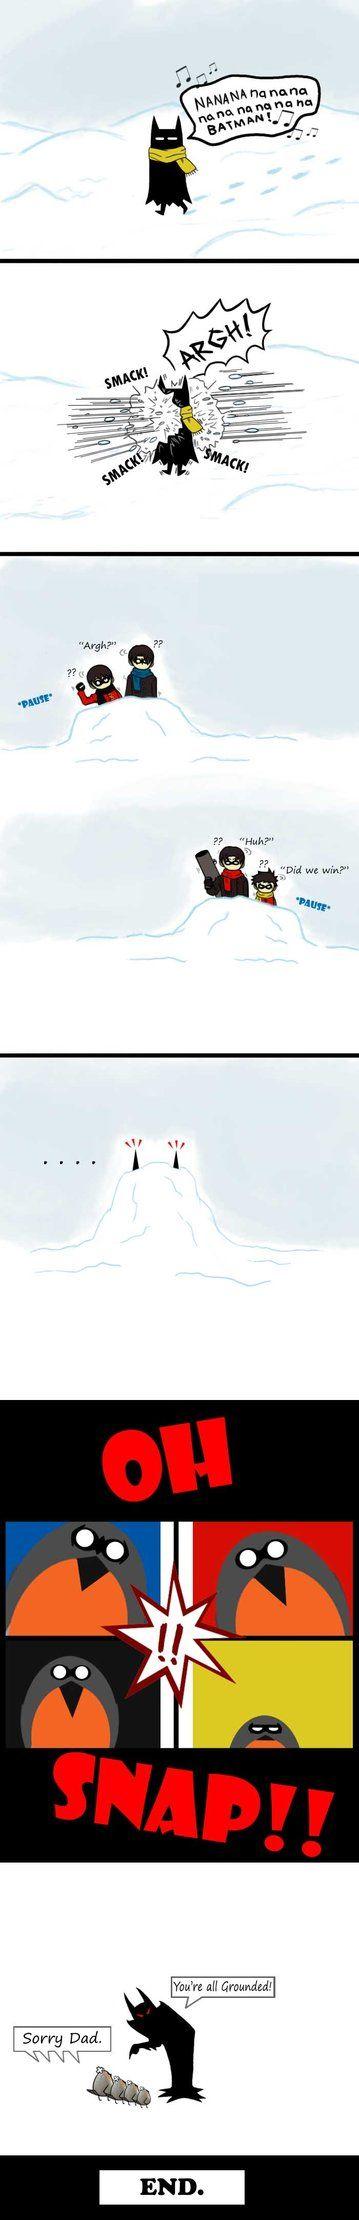 Batman Caught In The Middle by ~CrimsonHorror on deviantART